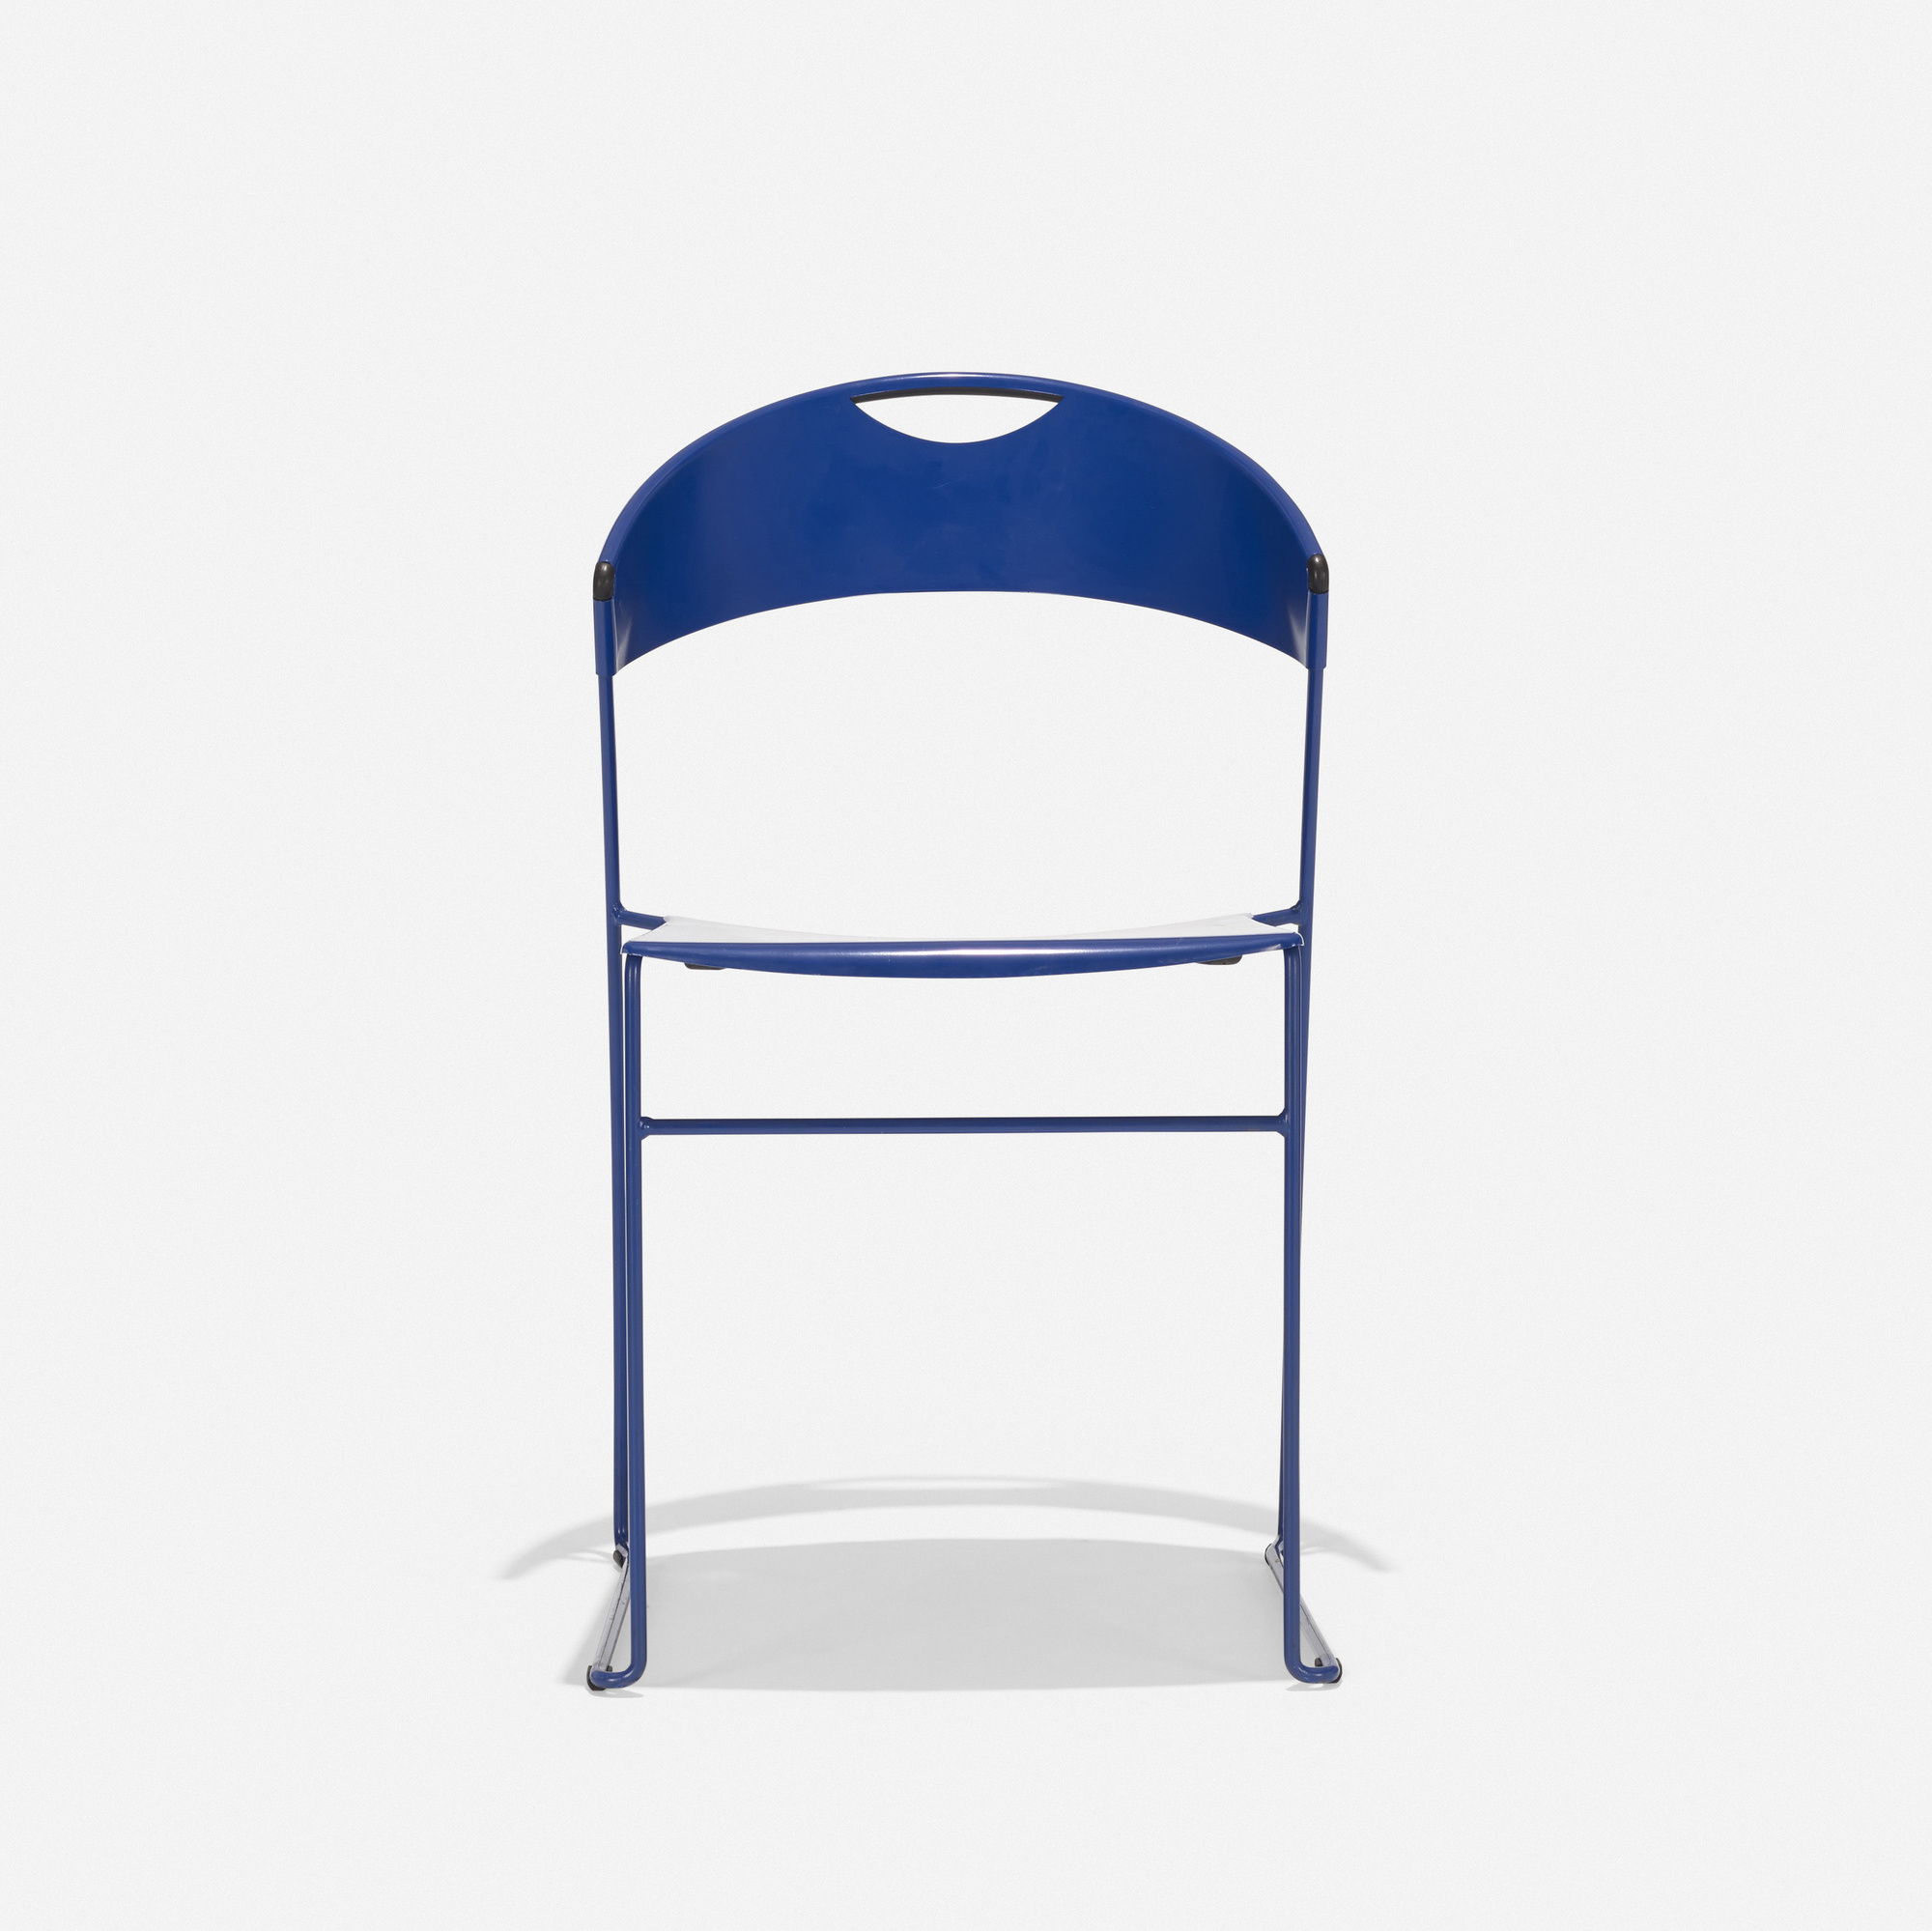 411: Hannes Wettstein / Juliette chair (2 of 4)